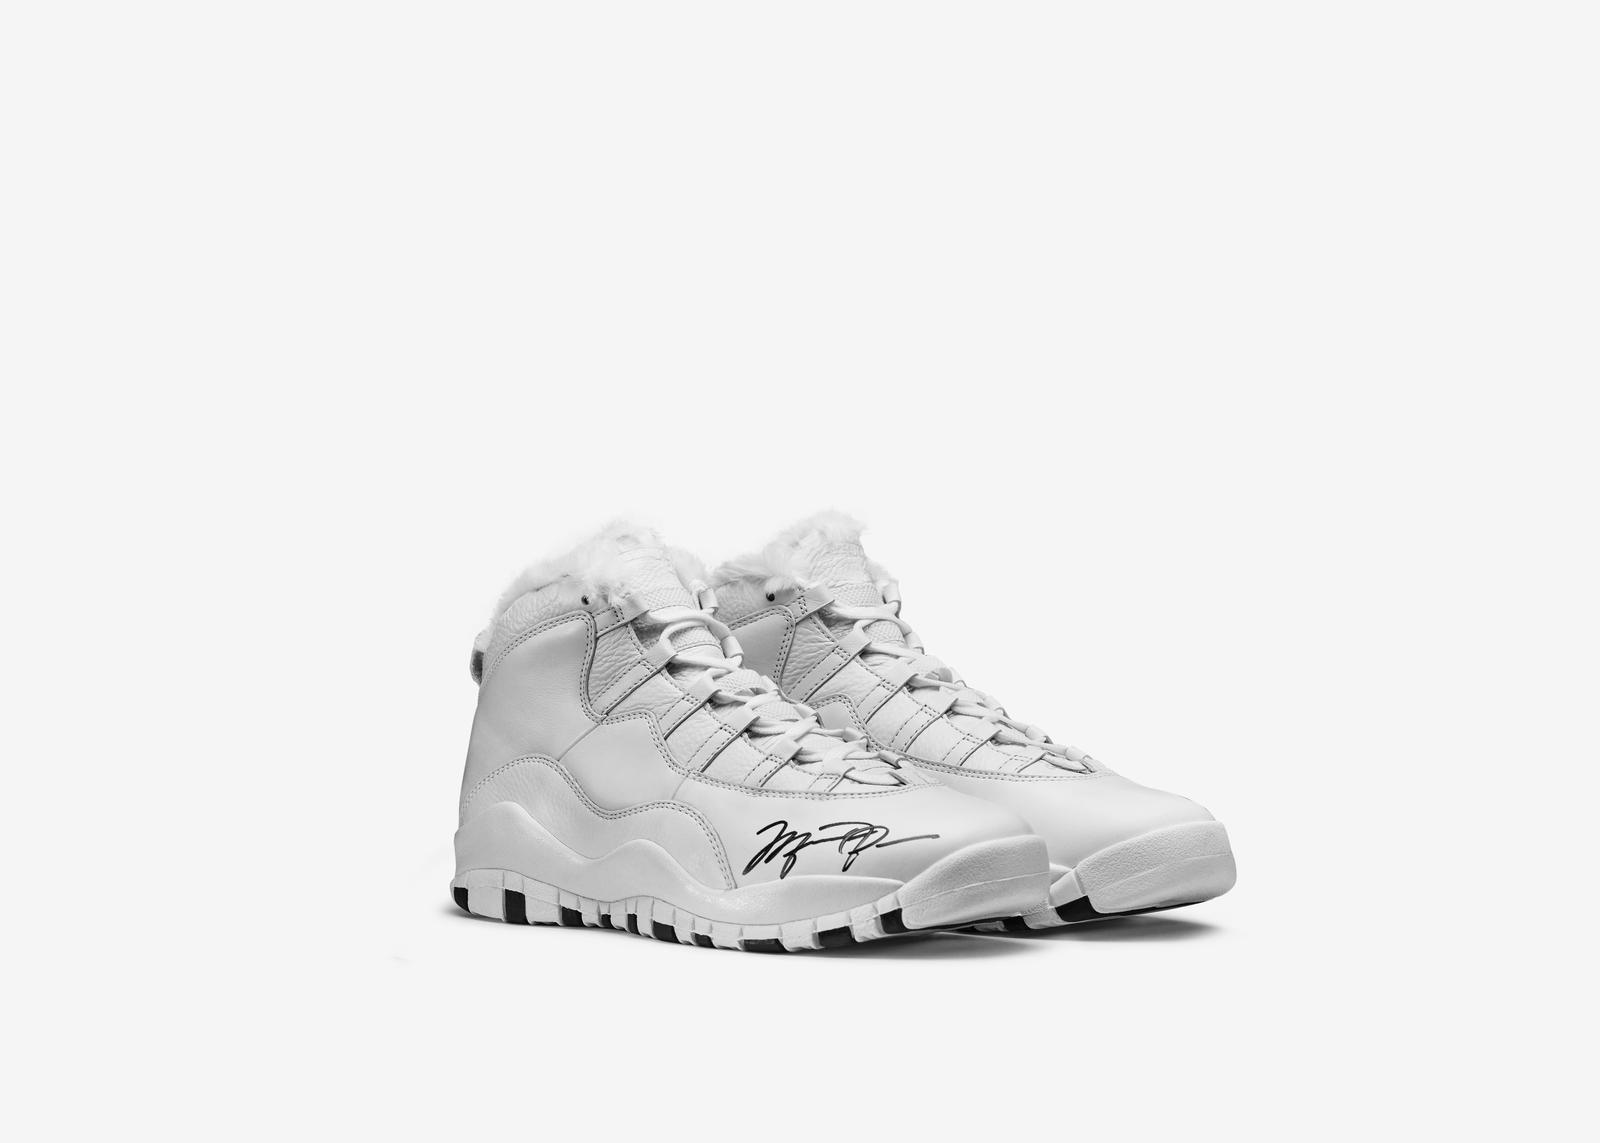 Nike jordan x auction w sz7 bty mj rectangle 1600